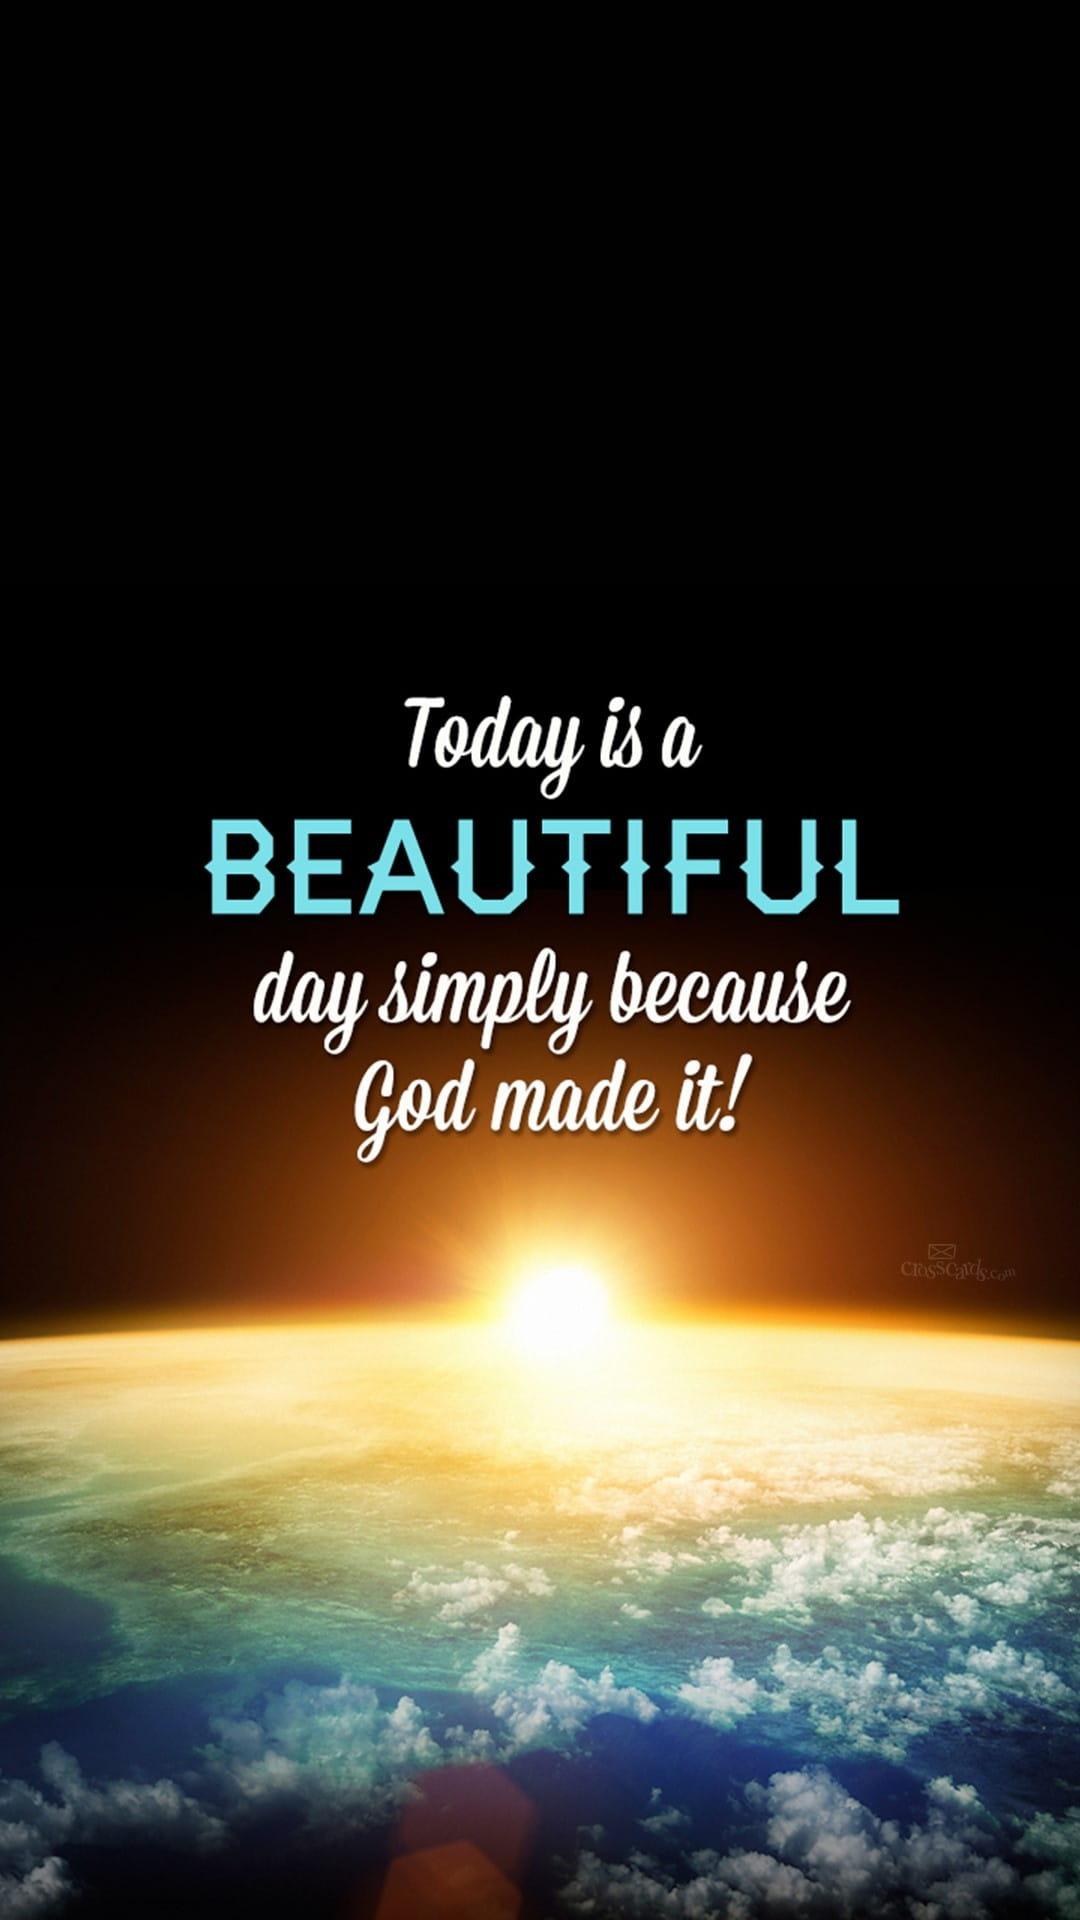 Scripture Quotes Desktop Wallpaper July 2016 Beautiful Day Desktop Calendar Free July